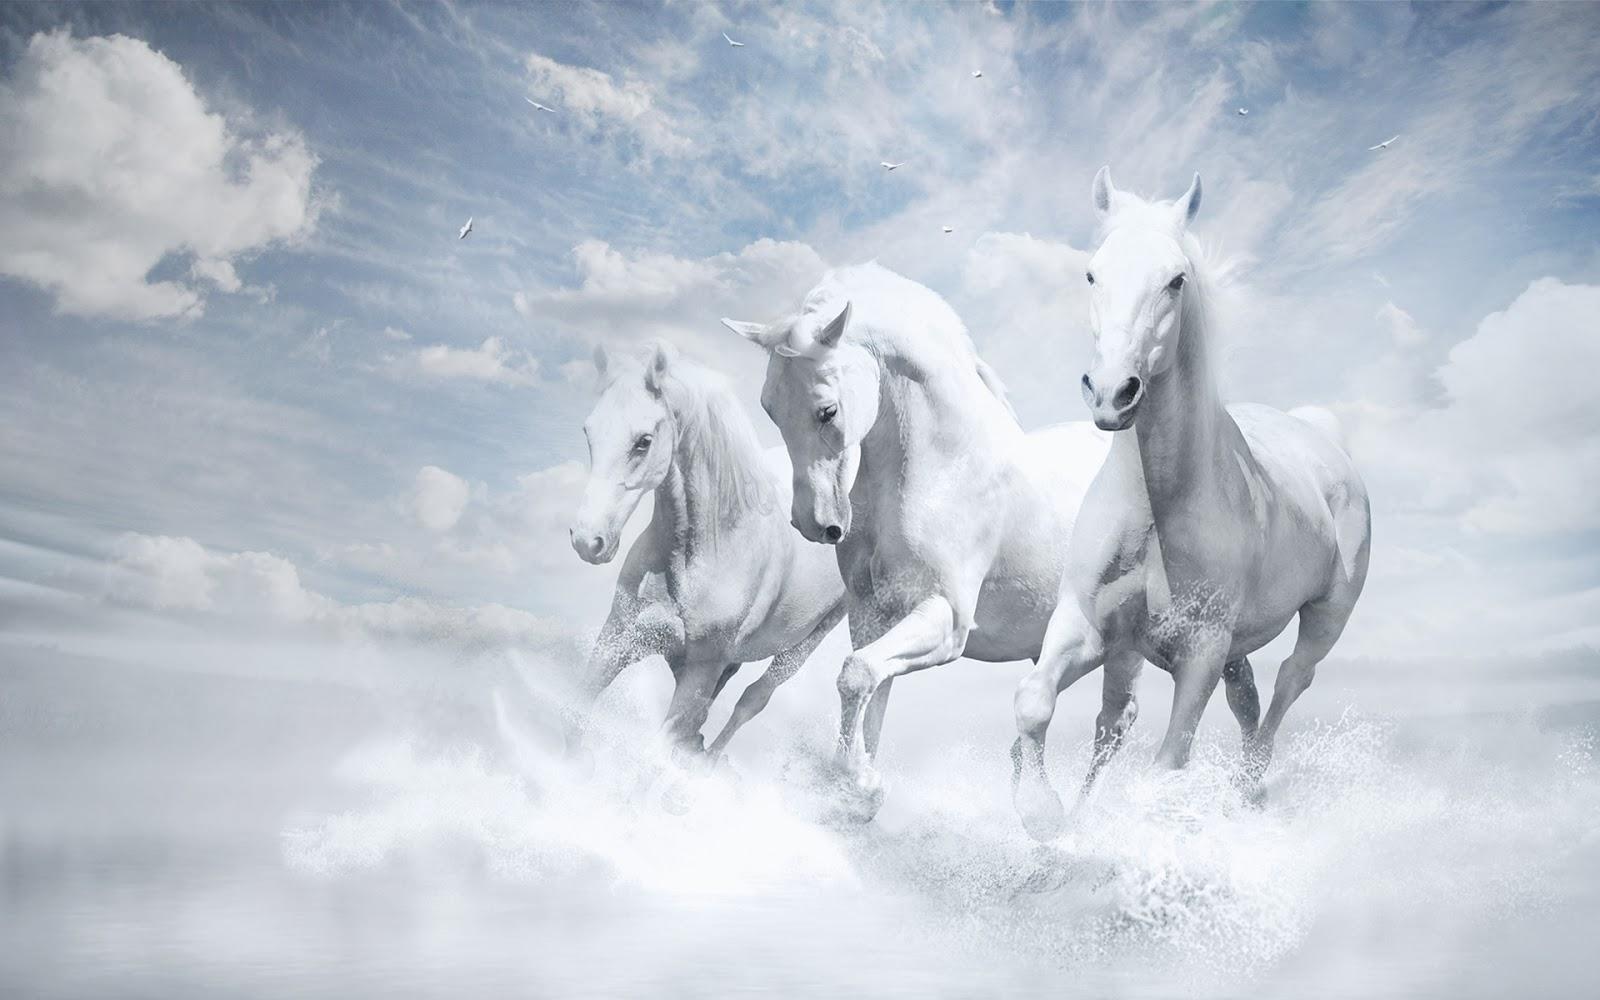 "<img src=""http://4.bp.blogspot.com/-_87HHYWwatg/UuFi4o_z0fI/AAAAAAAAJ_g/iuMwxOYk6xU/s1600/white-horse-wallpaper.jpg"" alt=""white horse wallpaper"" />"